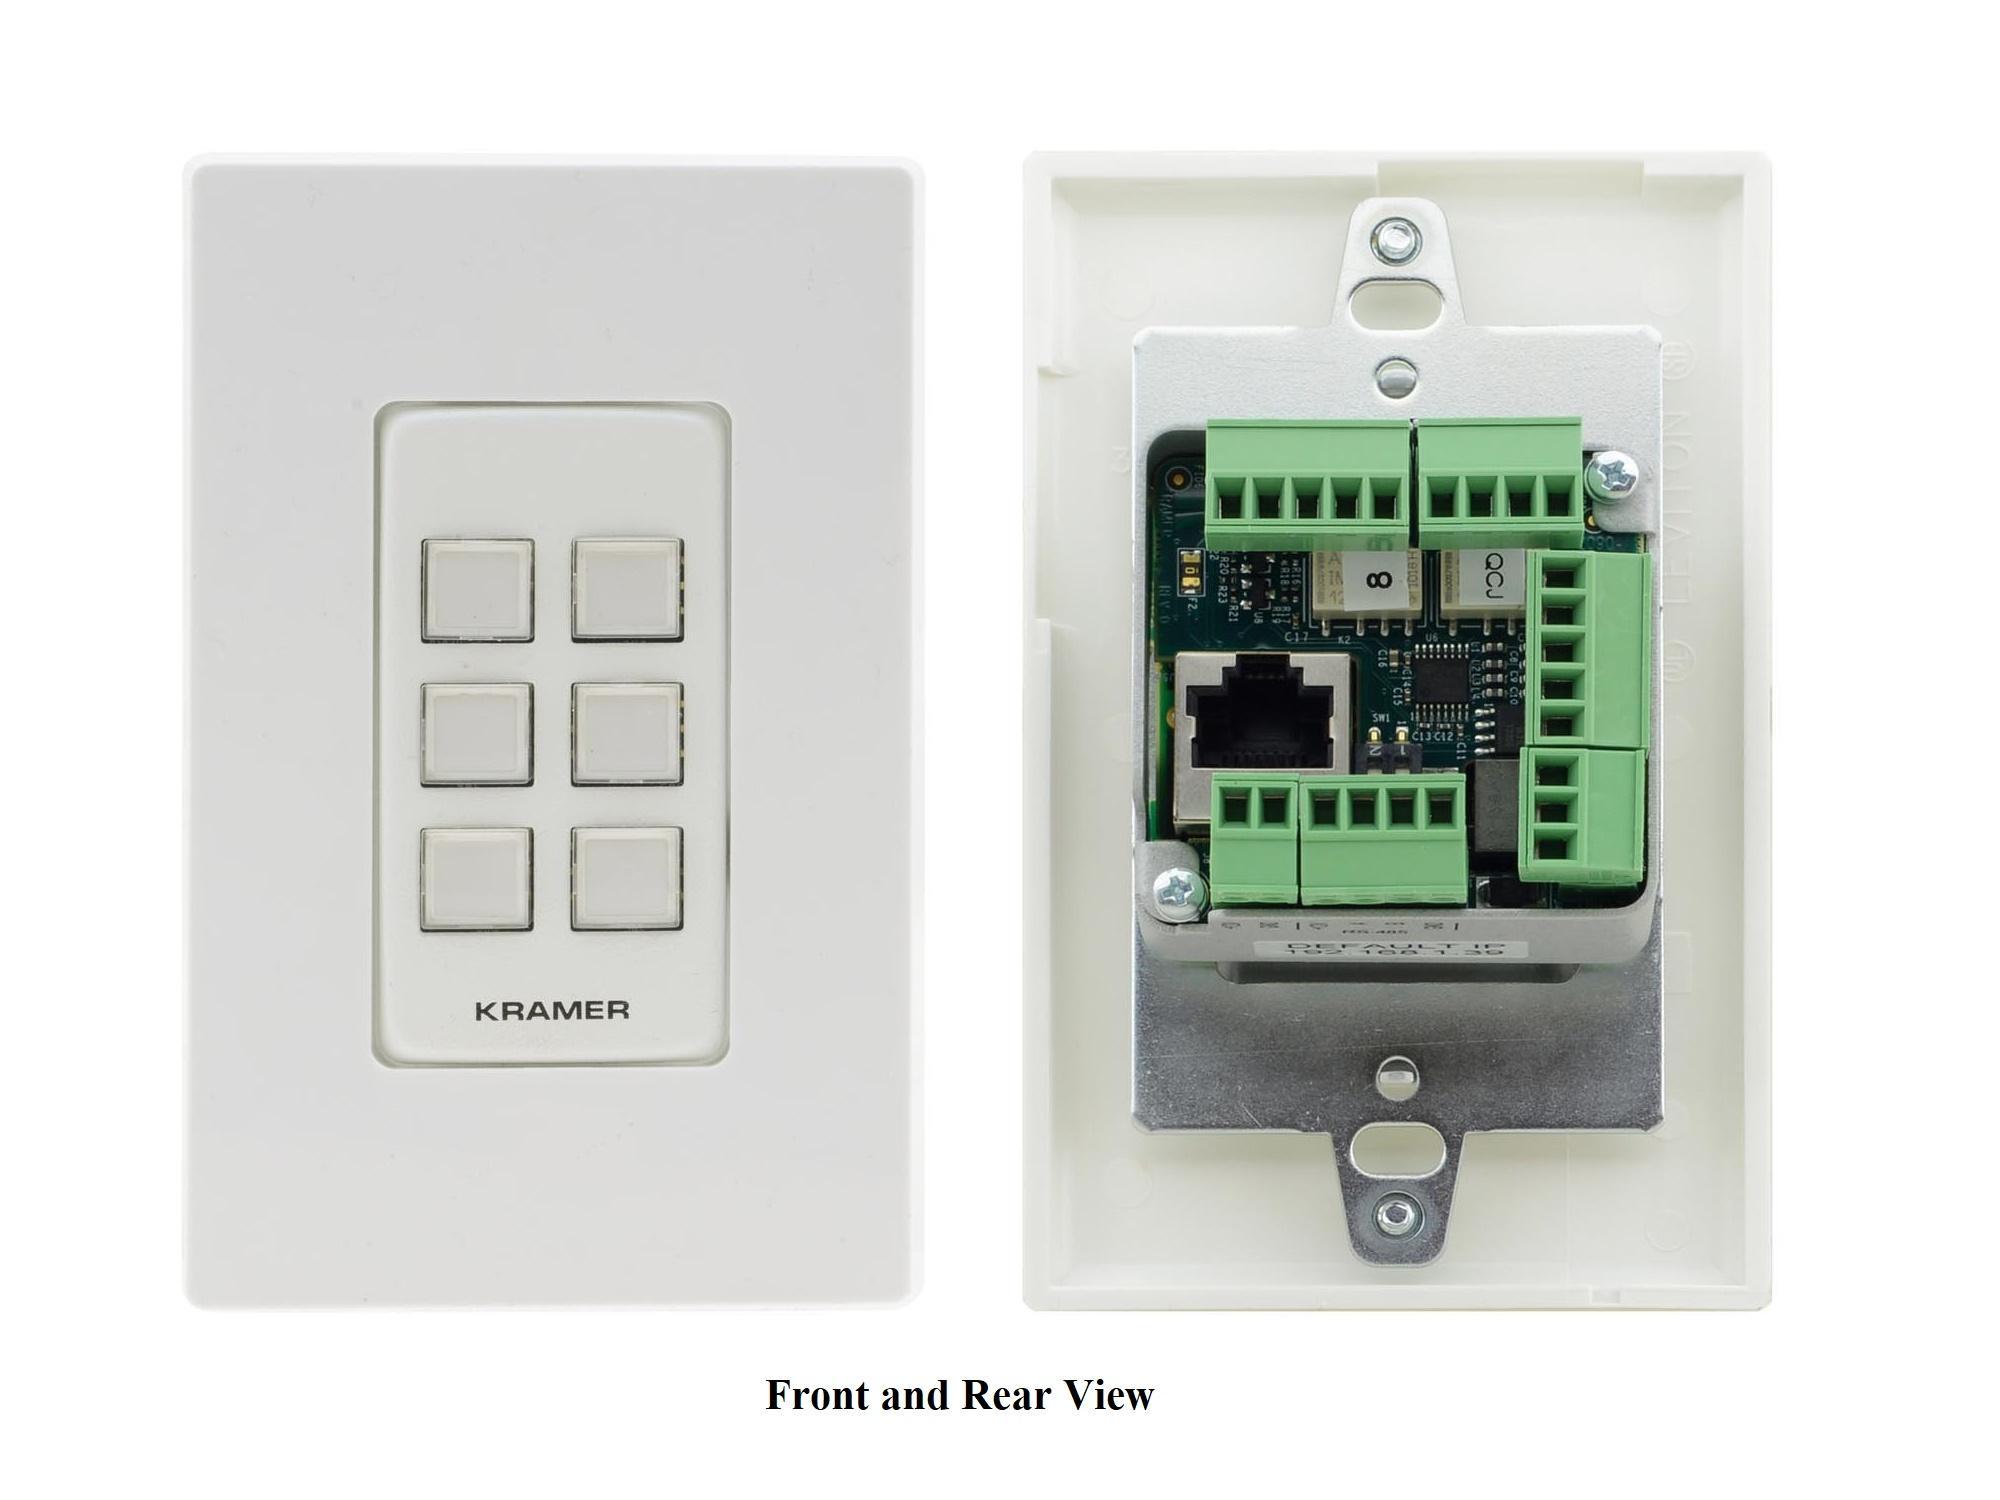 Kramer RC-206/US-D(W/B) 6-Button US-D-Size Control Keypad with White/Black Decora Design Frame Sets